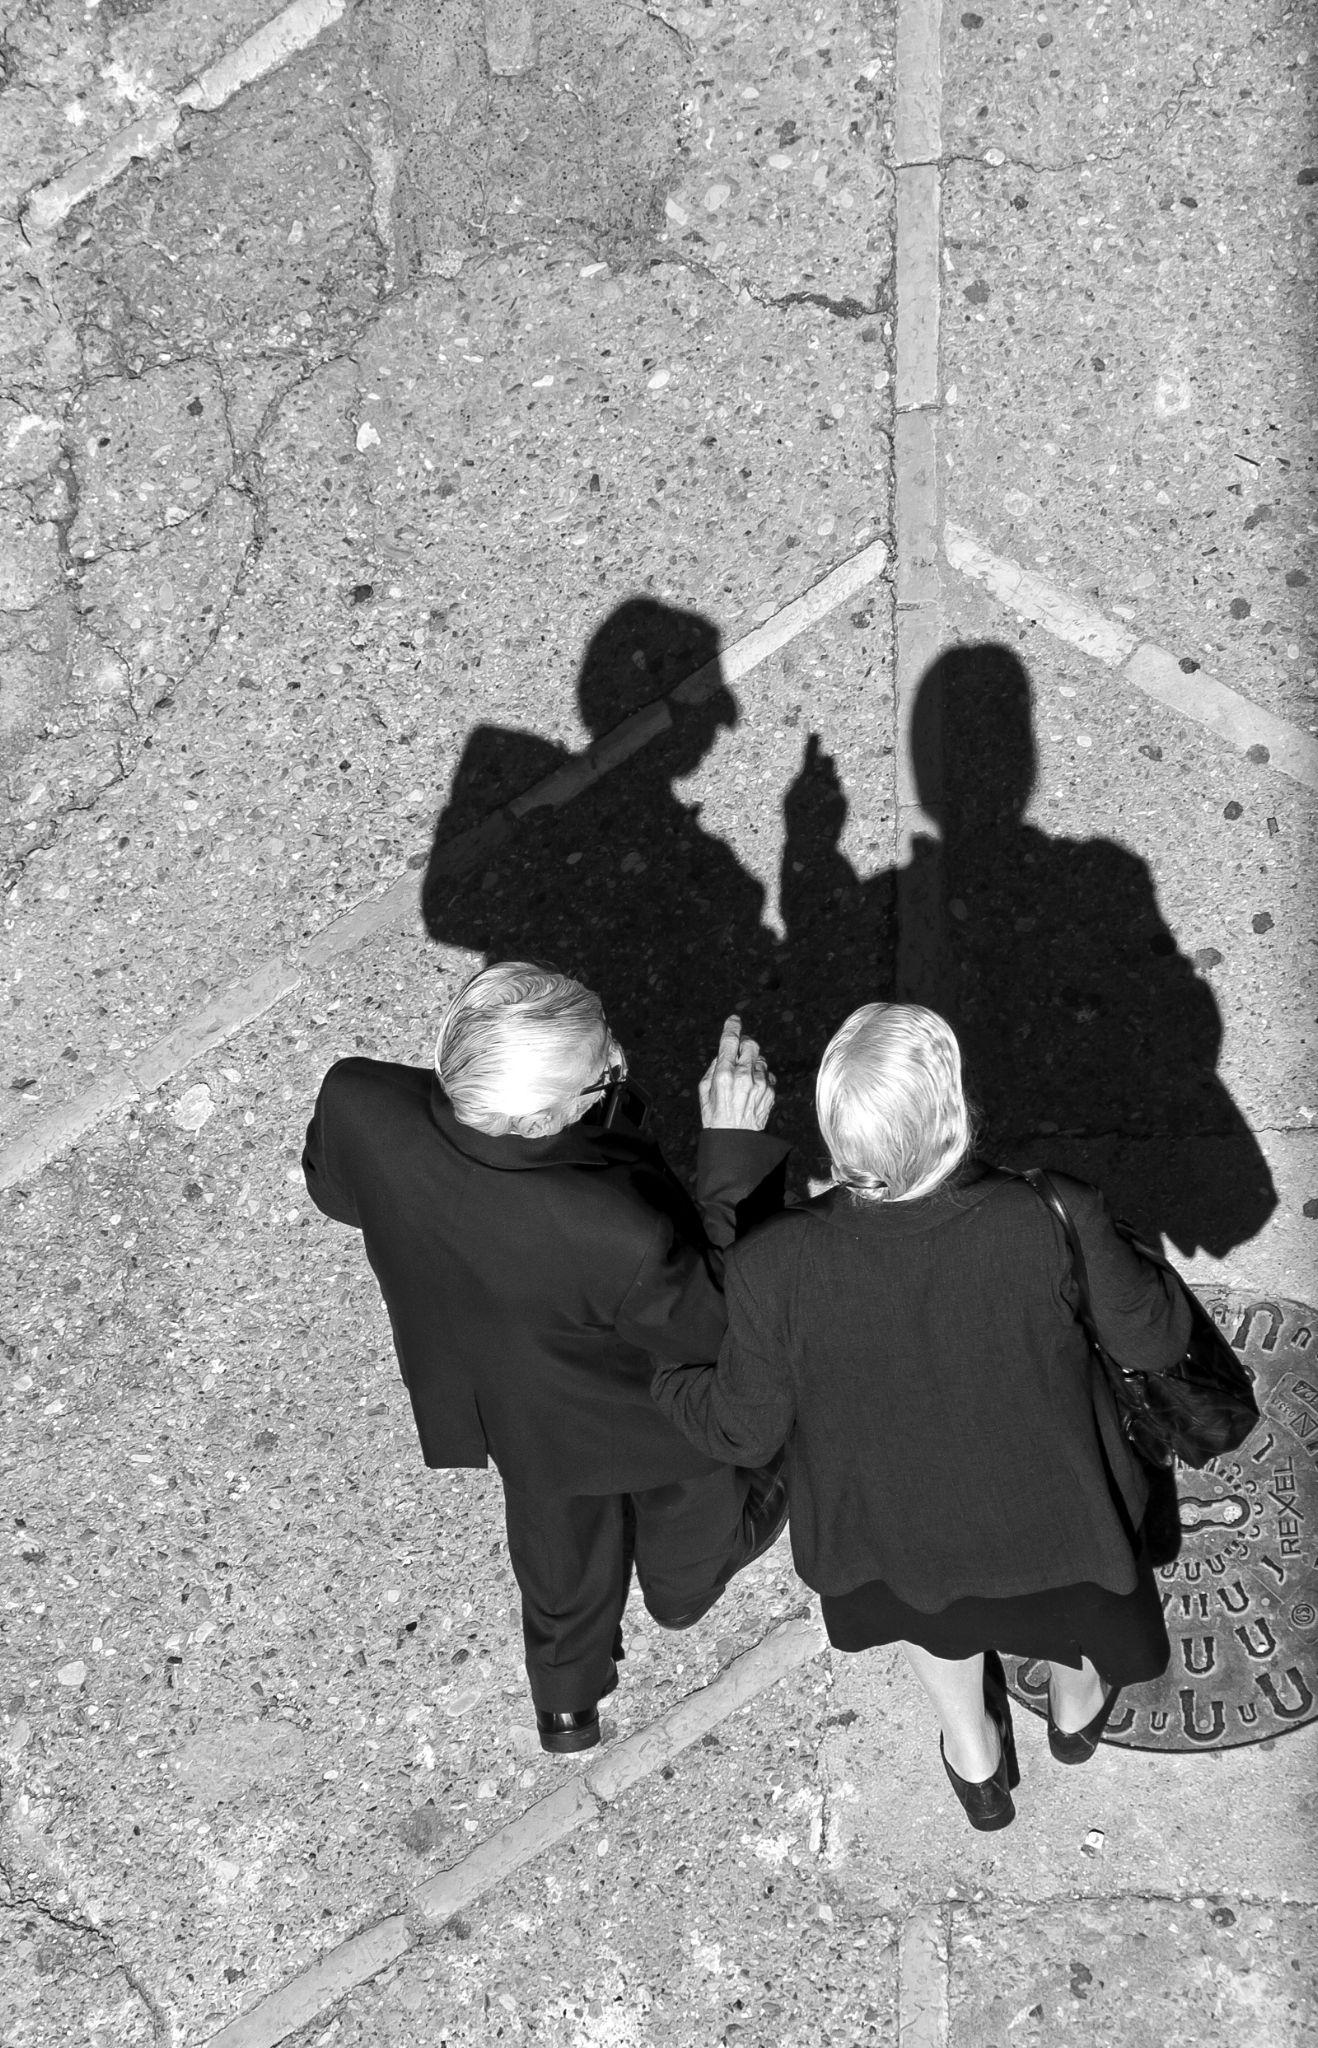 shadows by Markos Kyprianos